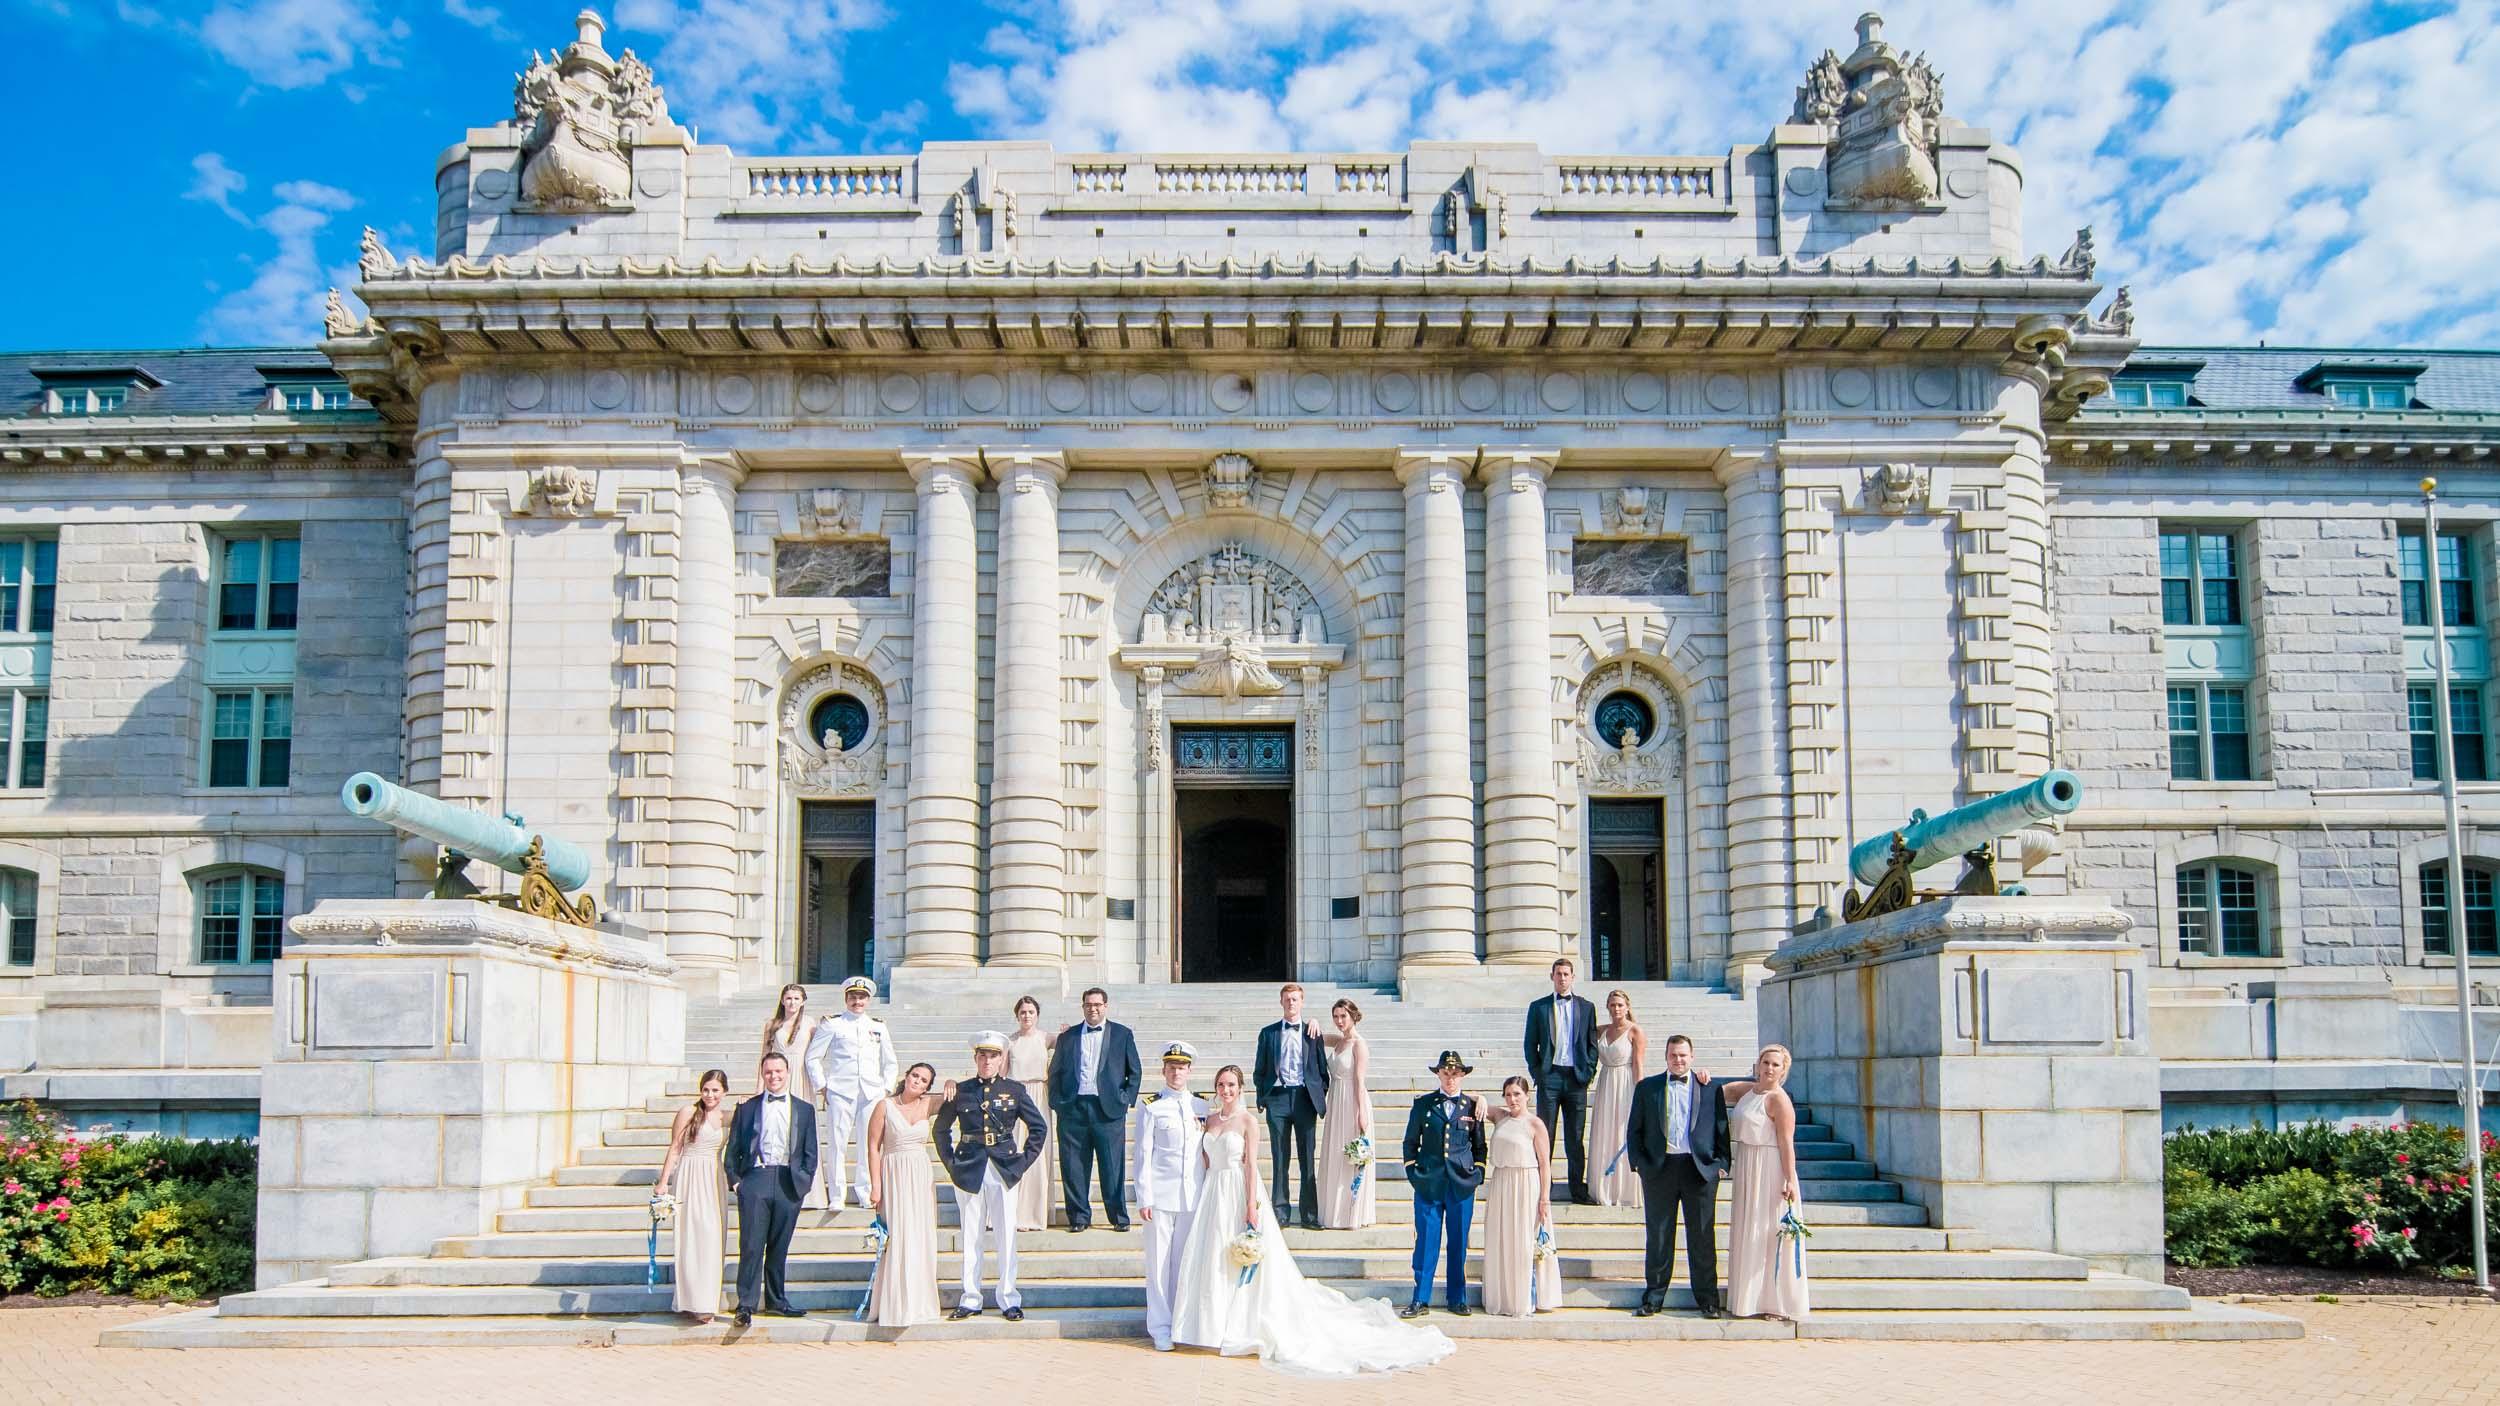 dc+metro+wedding+photographer+vadym+guliuk+photography+wedding+party-2025.jpg